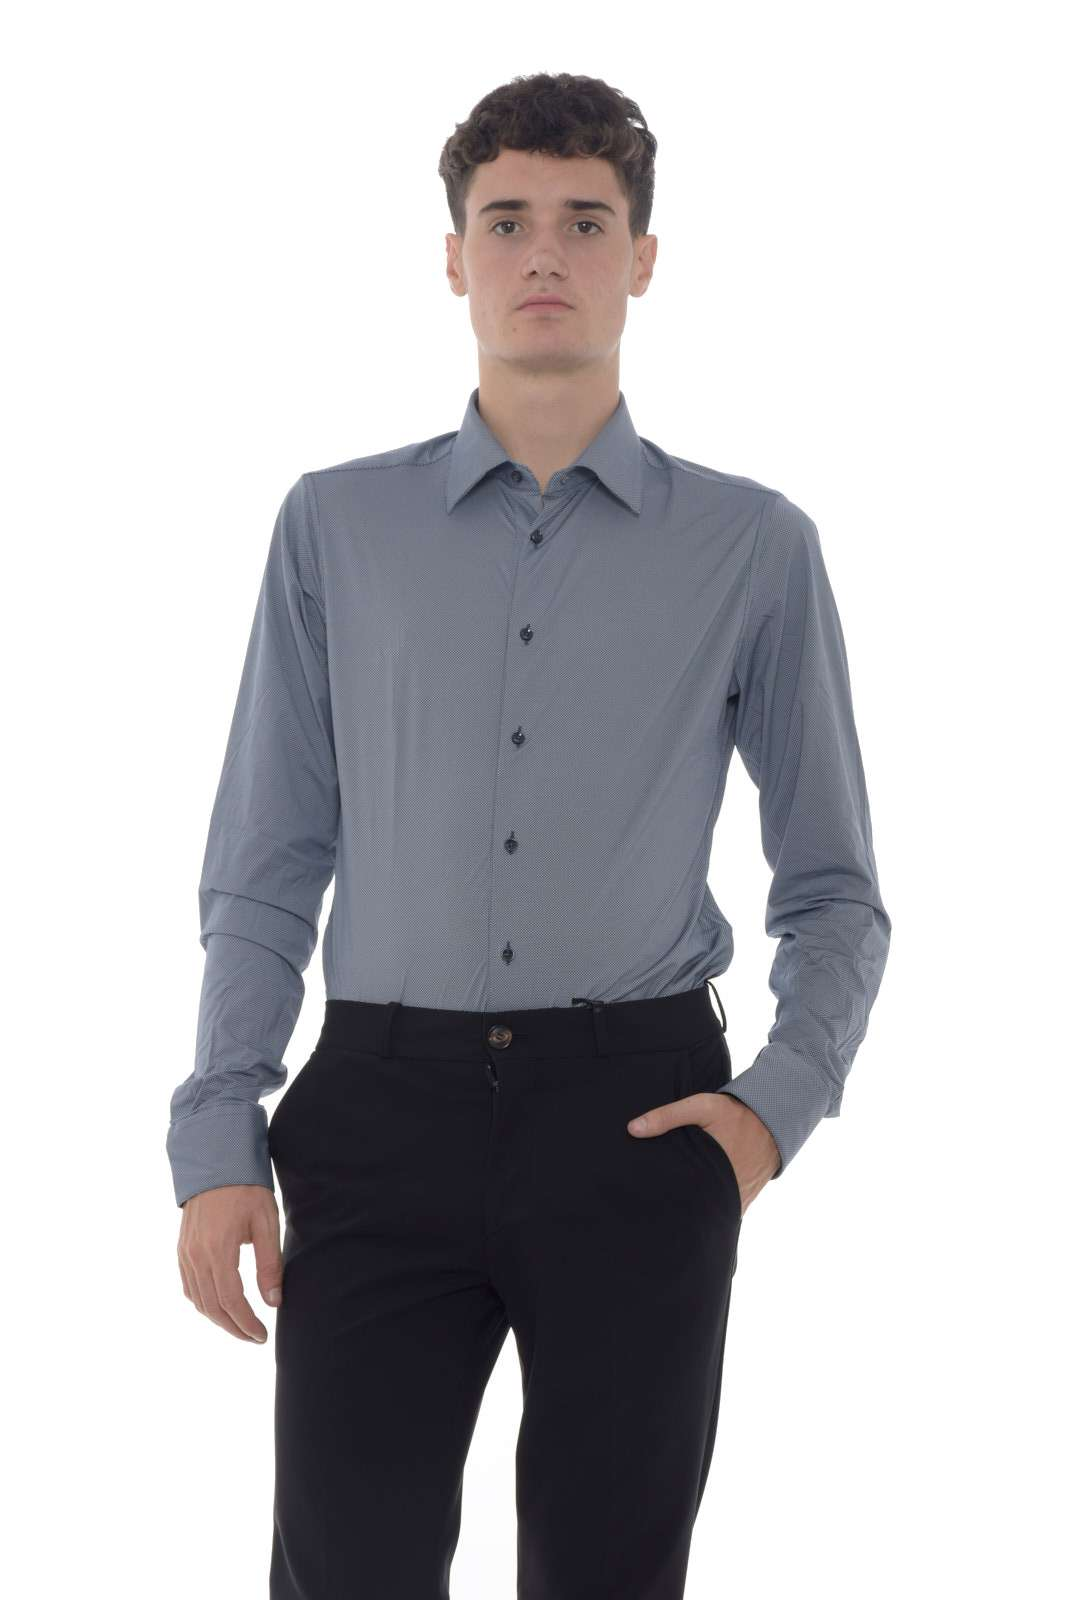 https://www.parmax.com/media/catalog/product/a/i/AI-outlet_parmax-camicia-uomo-RRD-W19255-A.jpg